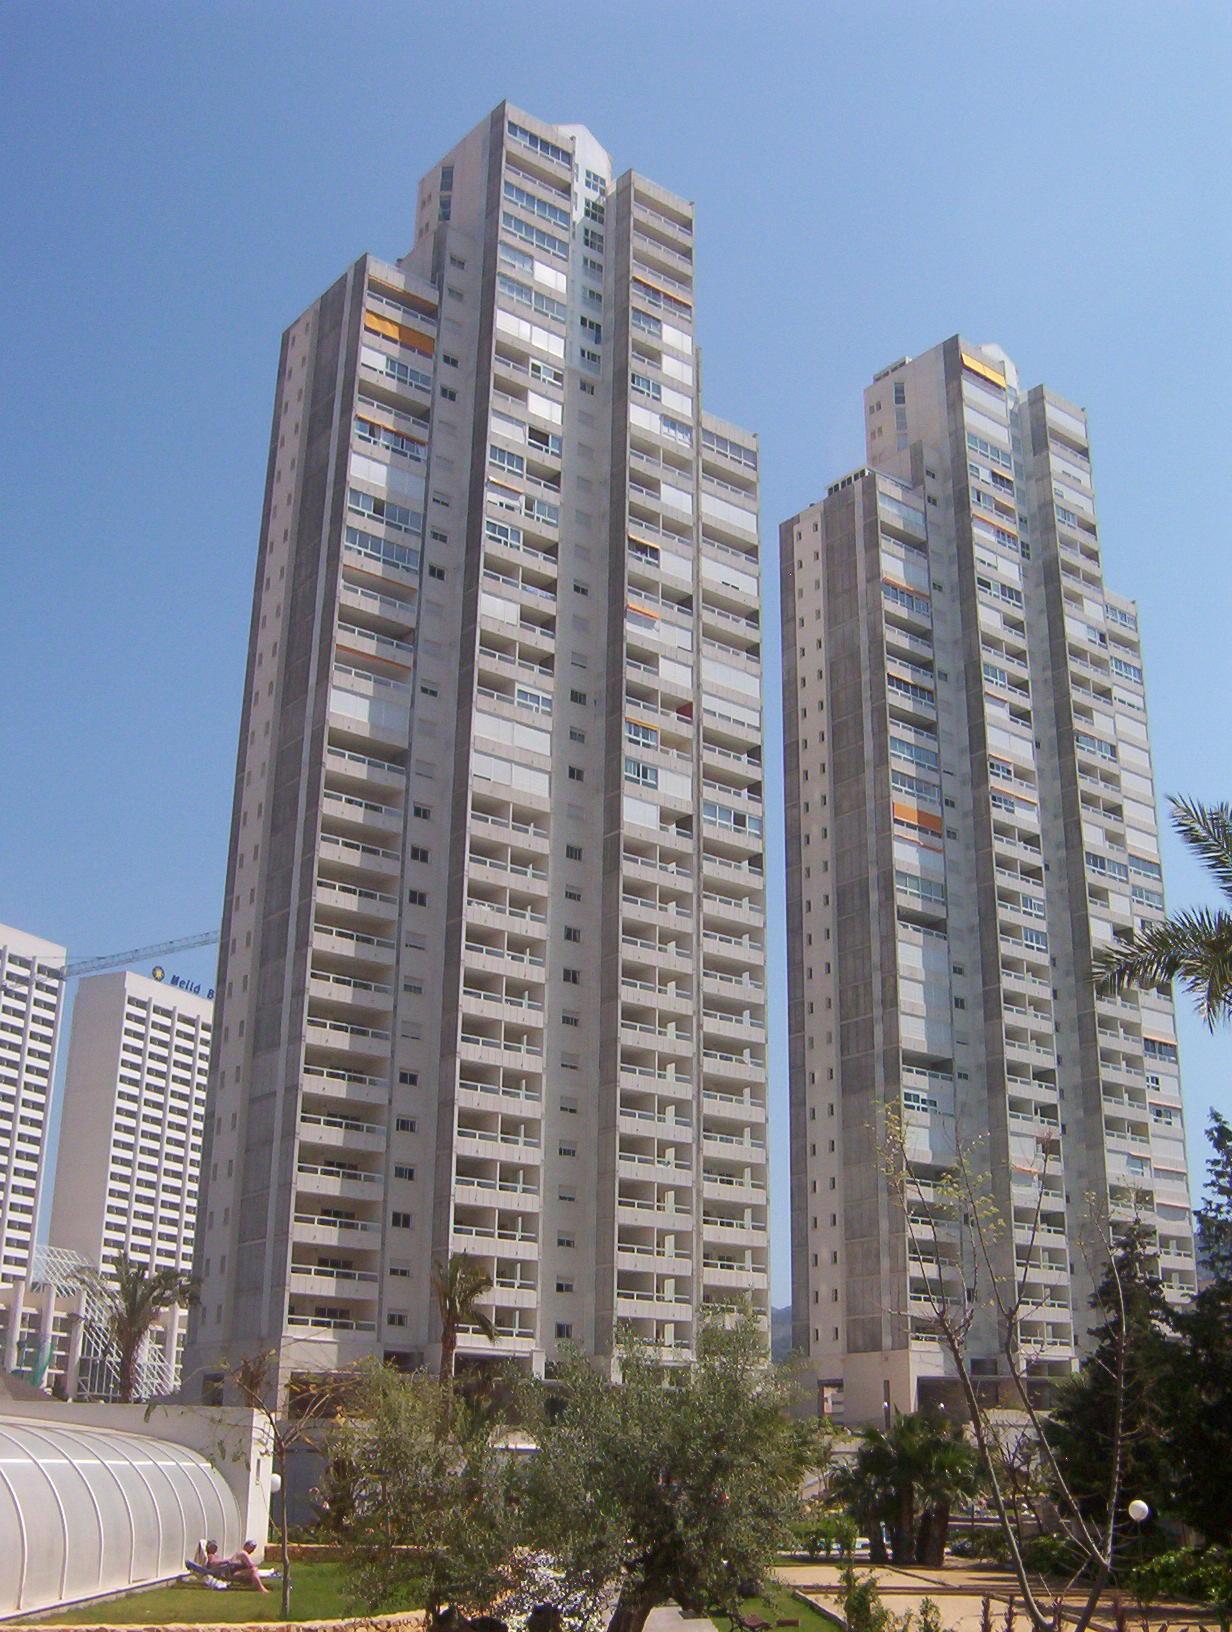 Apartamento -                                       Benidorm -                                       0 dormitorios -                                       0 ocupantes